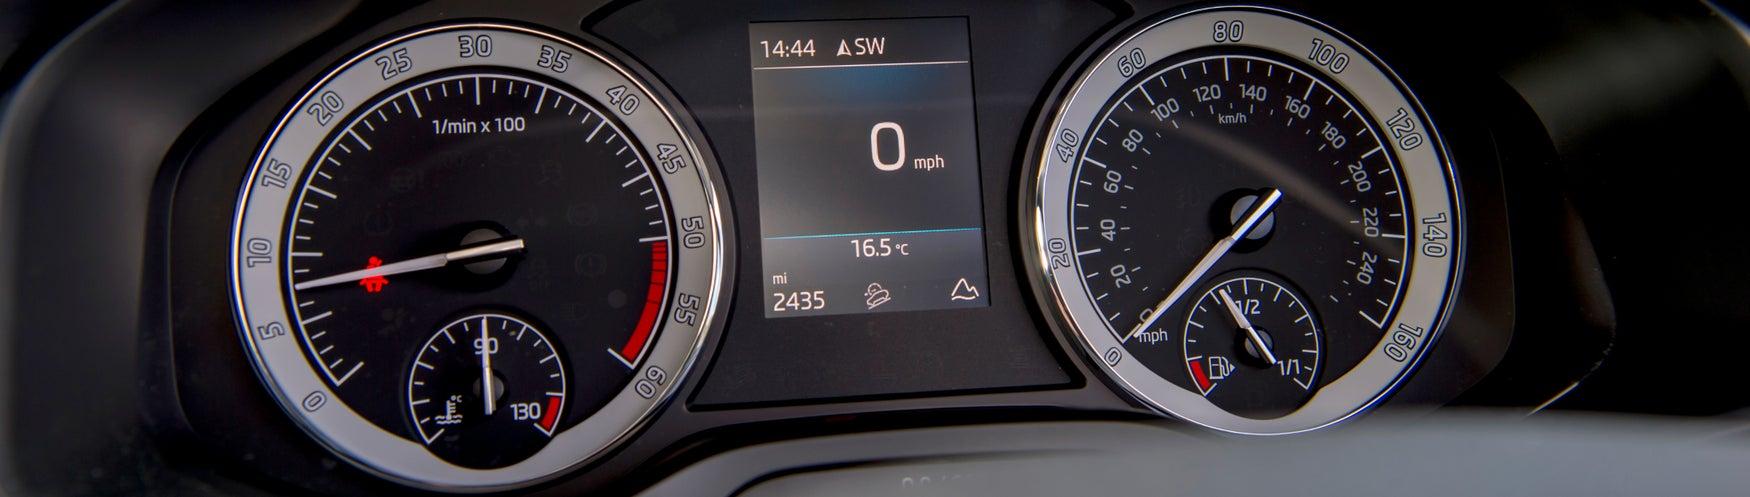 Low mileage dashboard